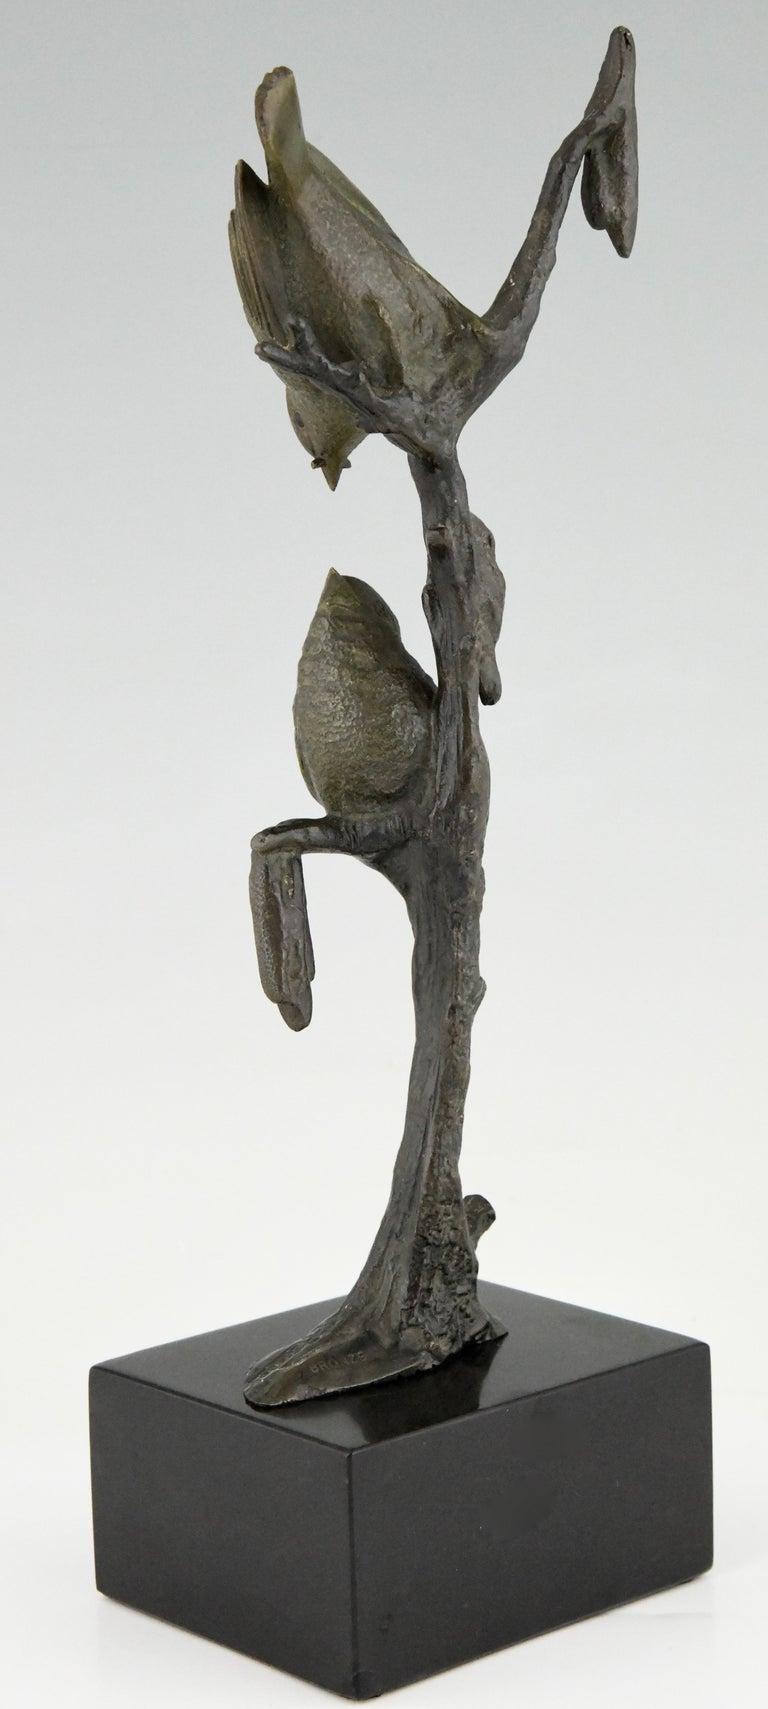 Art Deco Bronze Sculpture Two Birds on an Branch Irenee Rochard, France, 1930 In Good Condition For Sale In Antwerp, BE